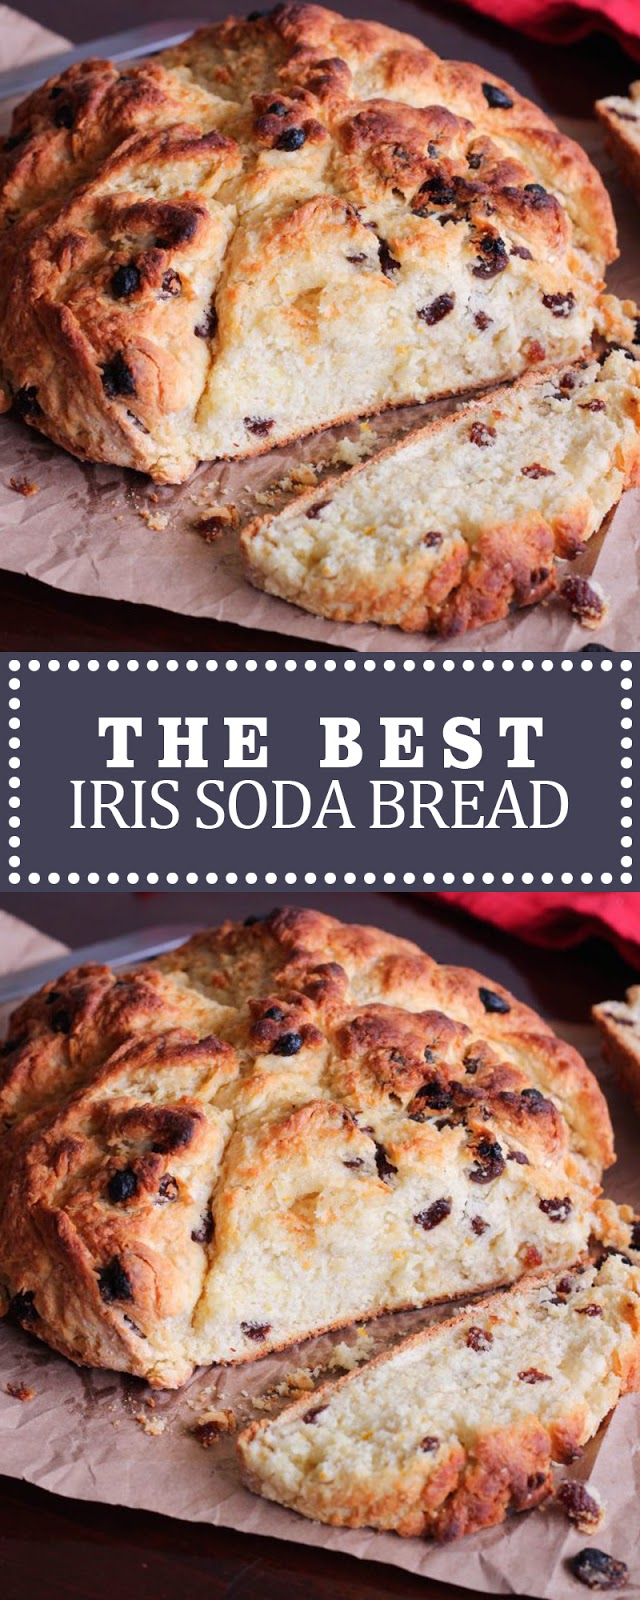 THE BEST IRISH SODA BREAD